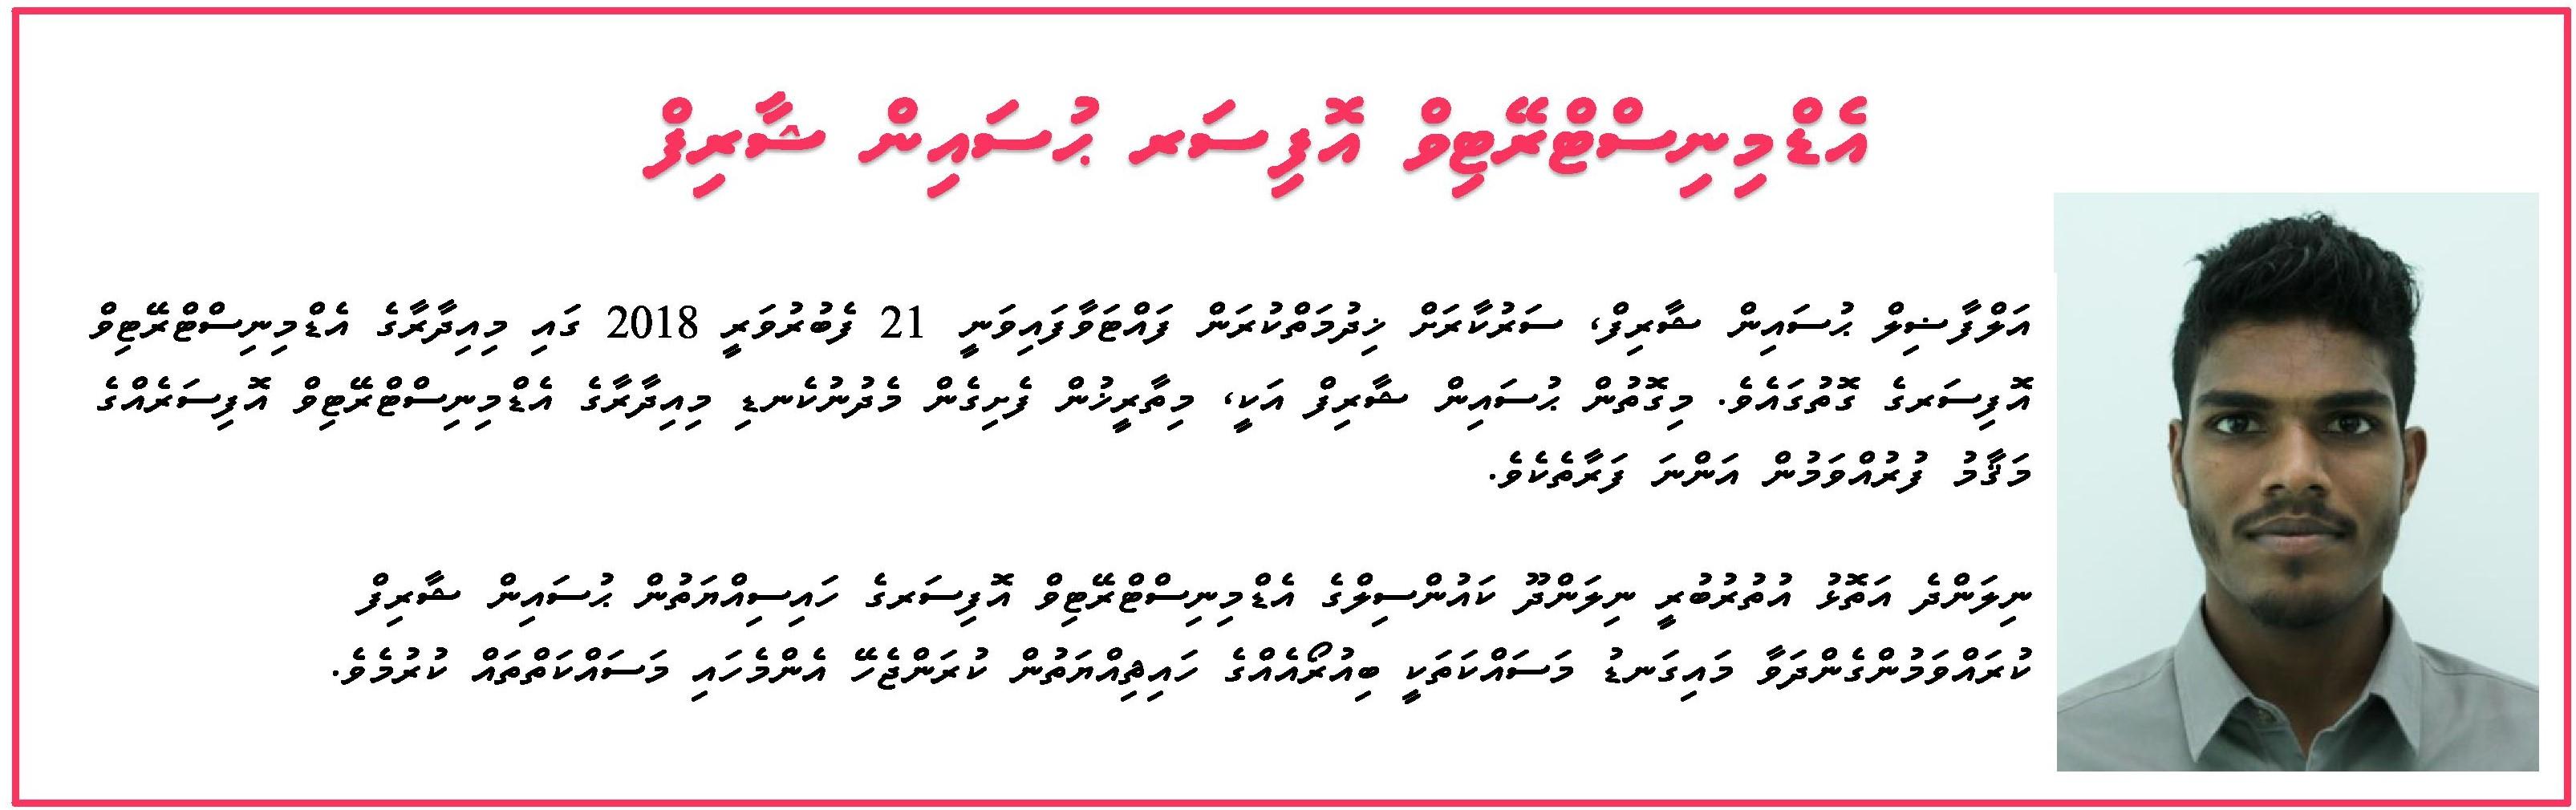 10. Administrative Officer Hussain Sharif